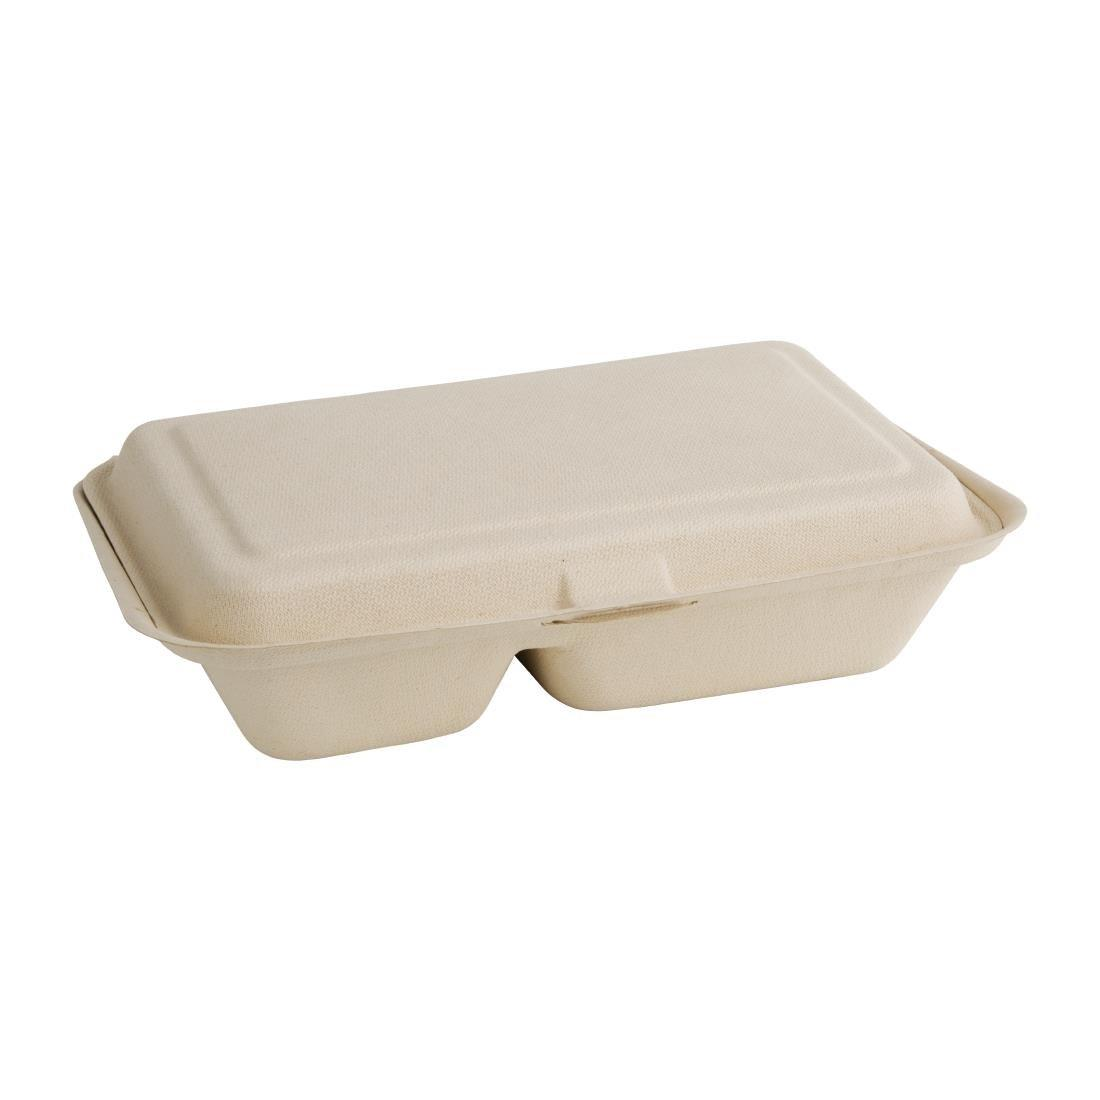 Pack of 250 Vegware VB12 bagasse clamshell 12 x 6